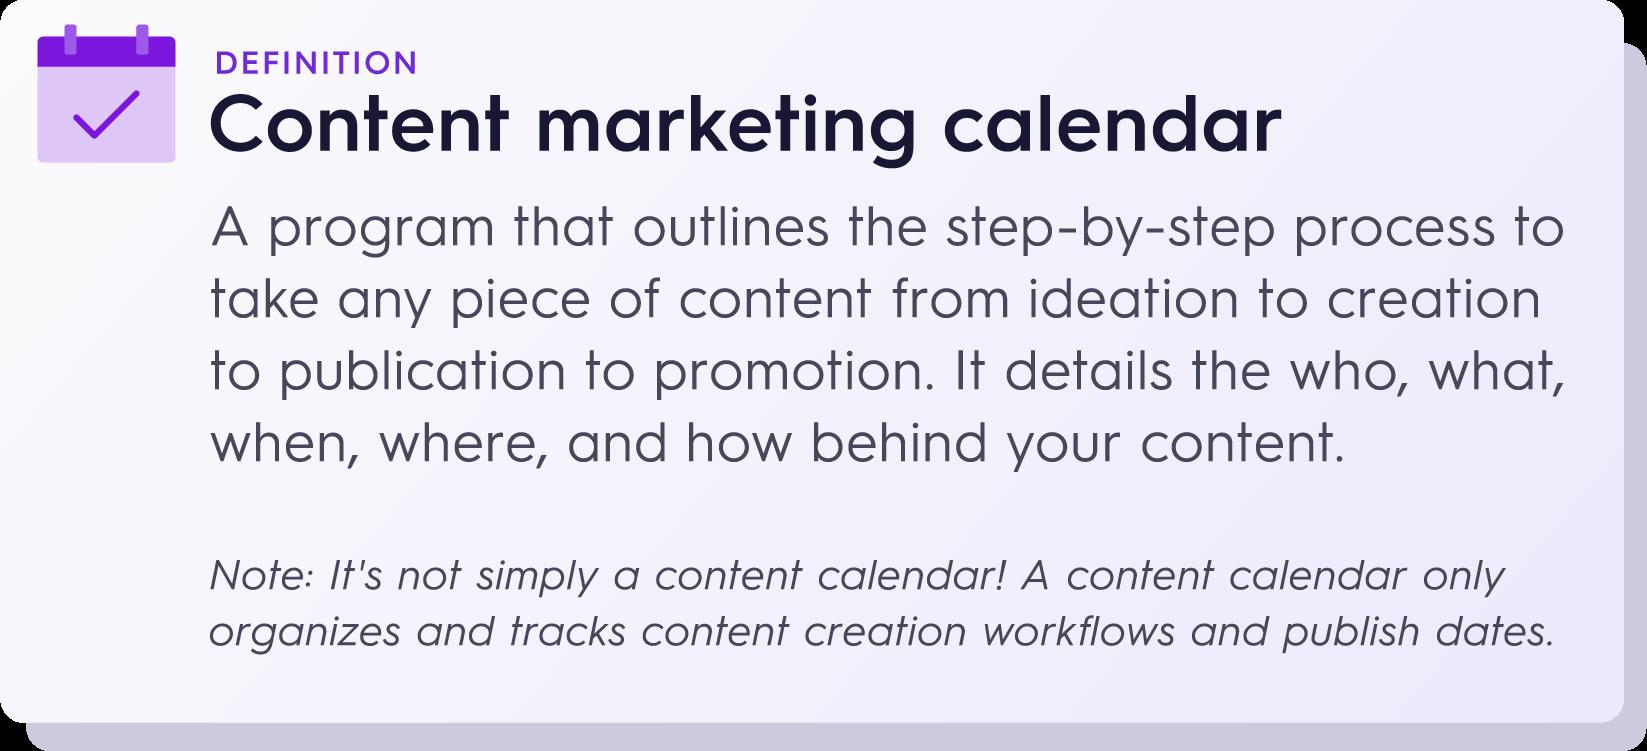 Content Marketing Calendar Definition